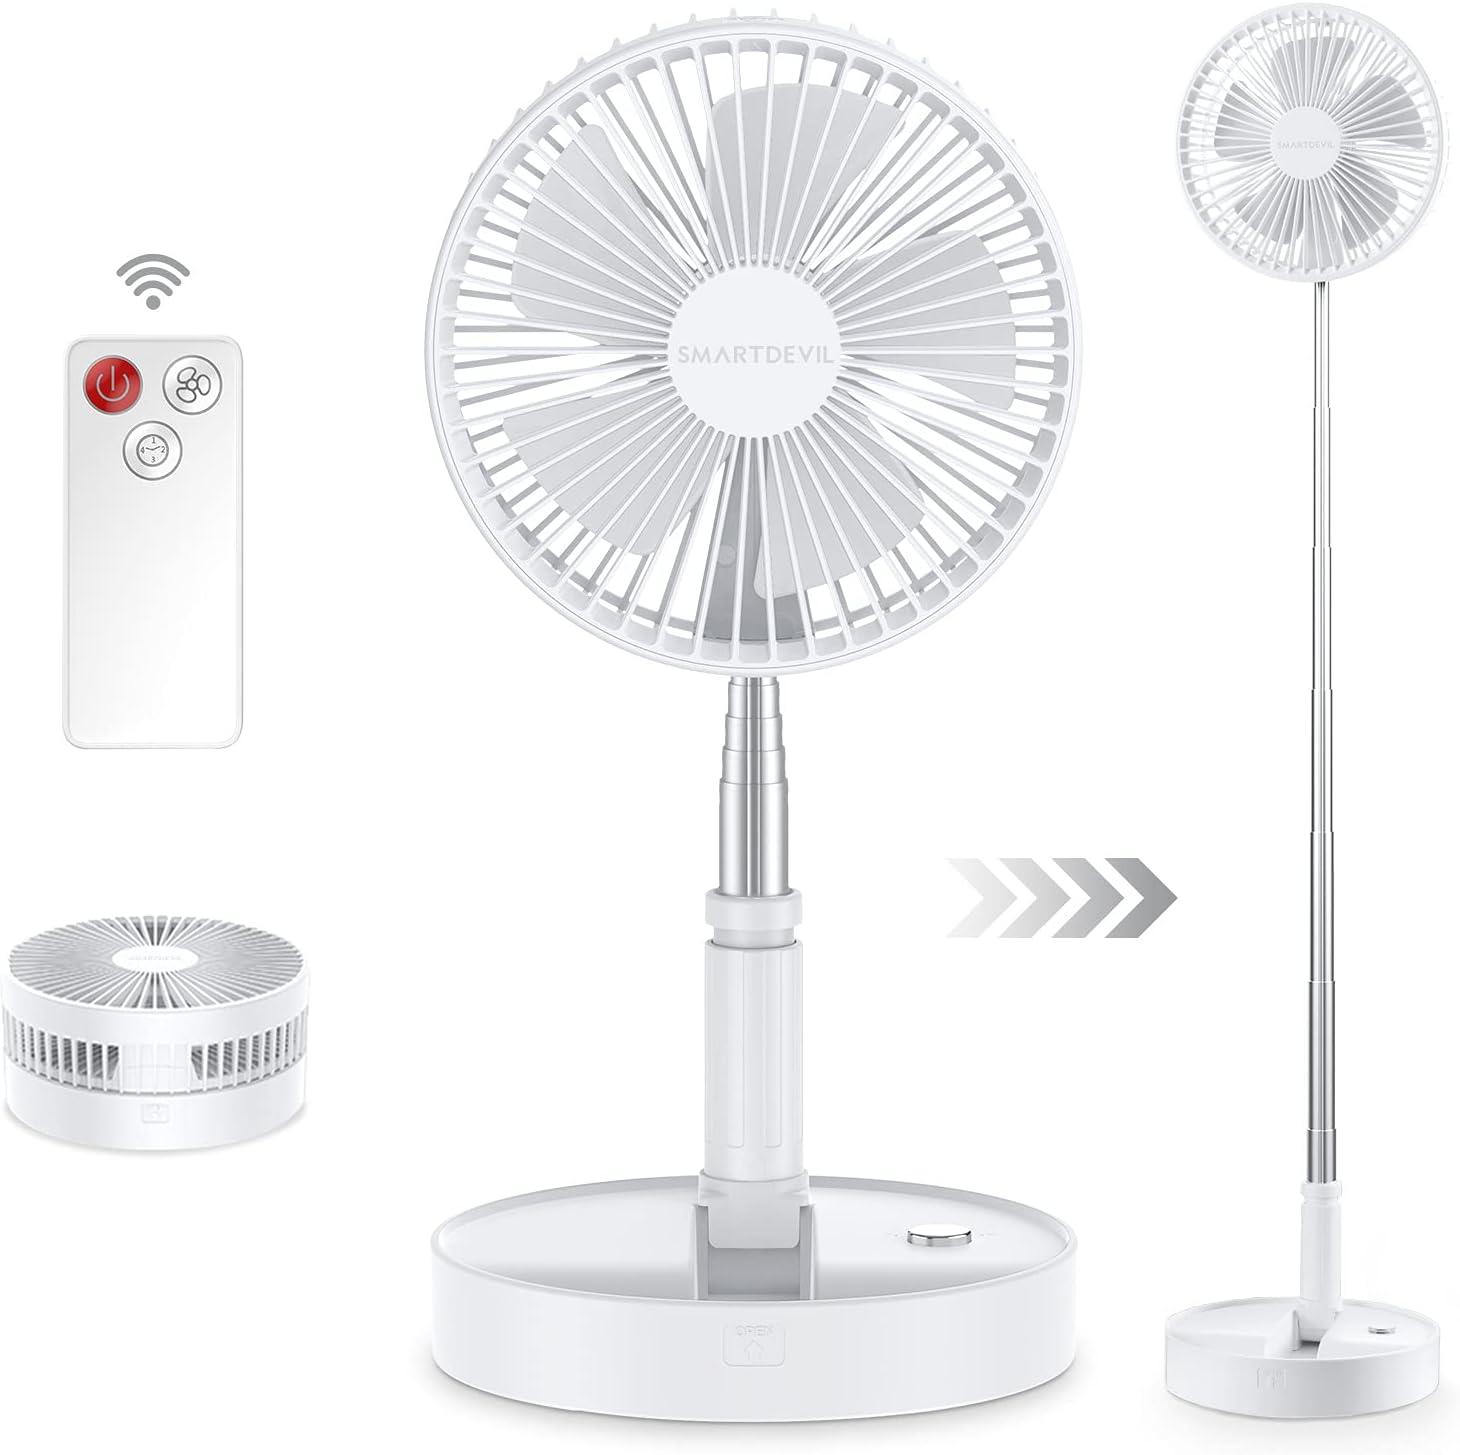 SmartDevil Stand Fan 2-in-1 Folding Tele Now on sale Portable Free shipping New Multi-Purpose